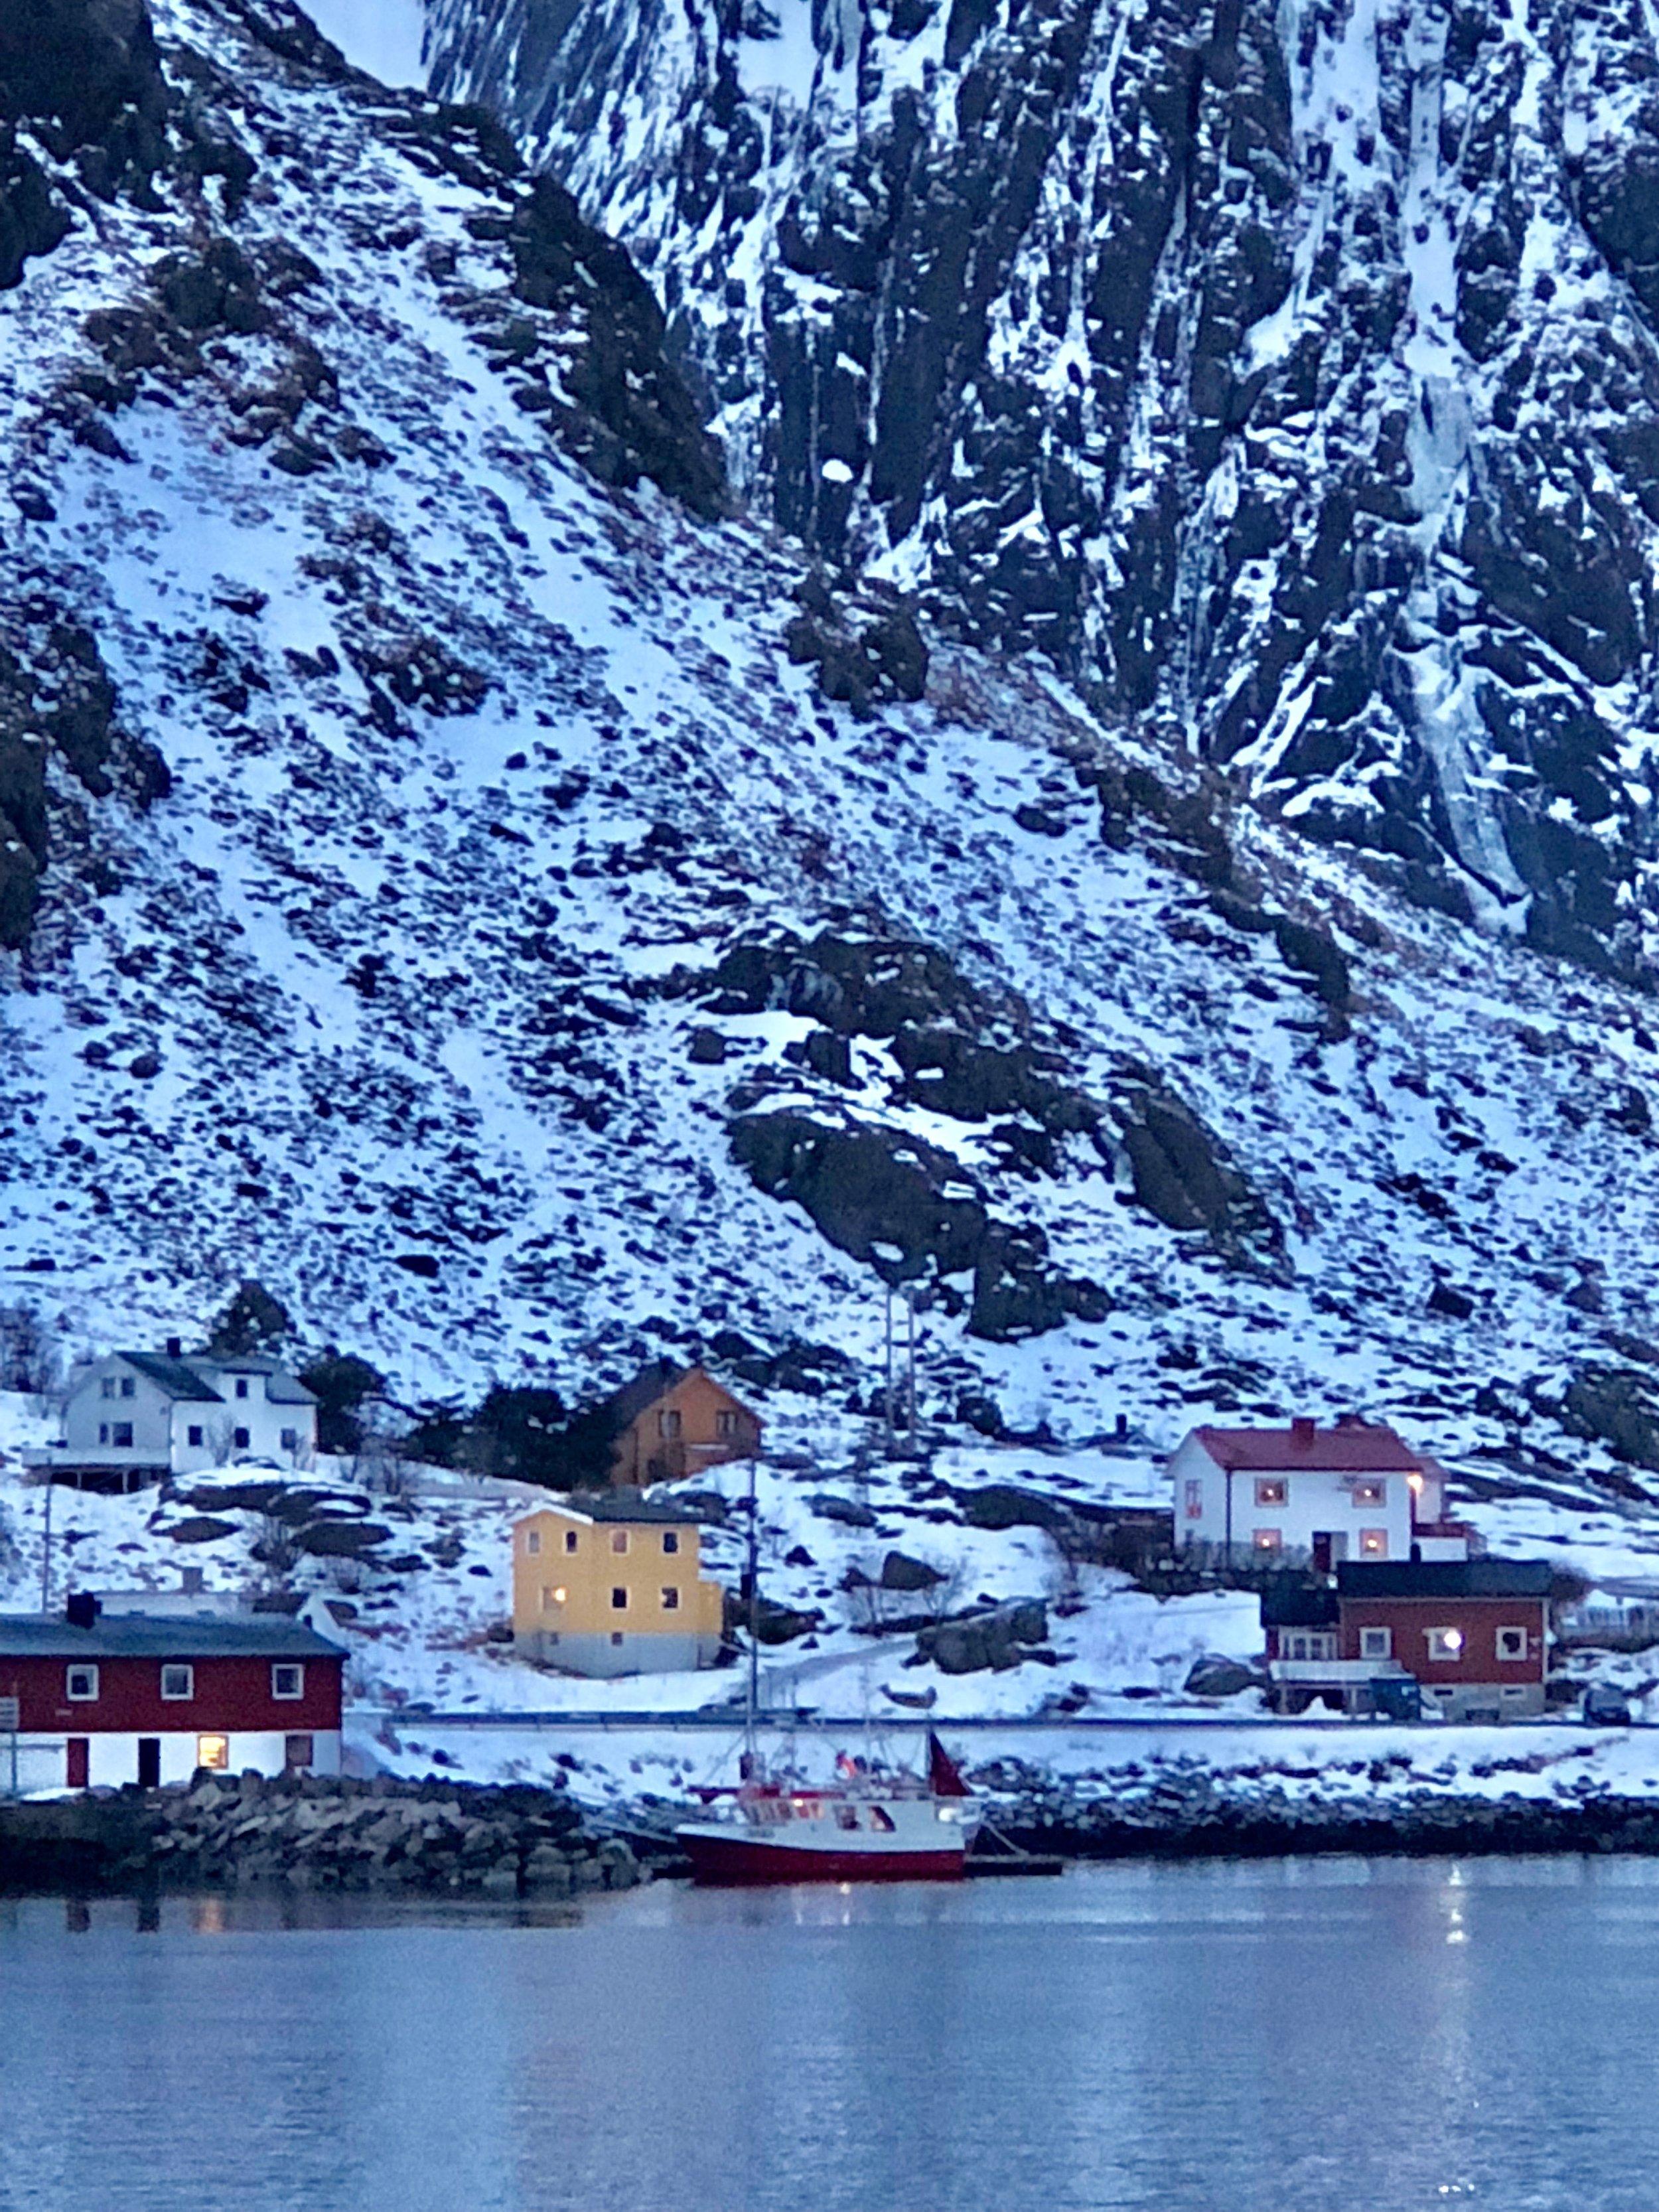 Lofoten 内一个较大的渔业重区-Ballstad